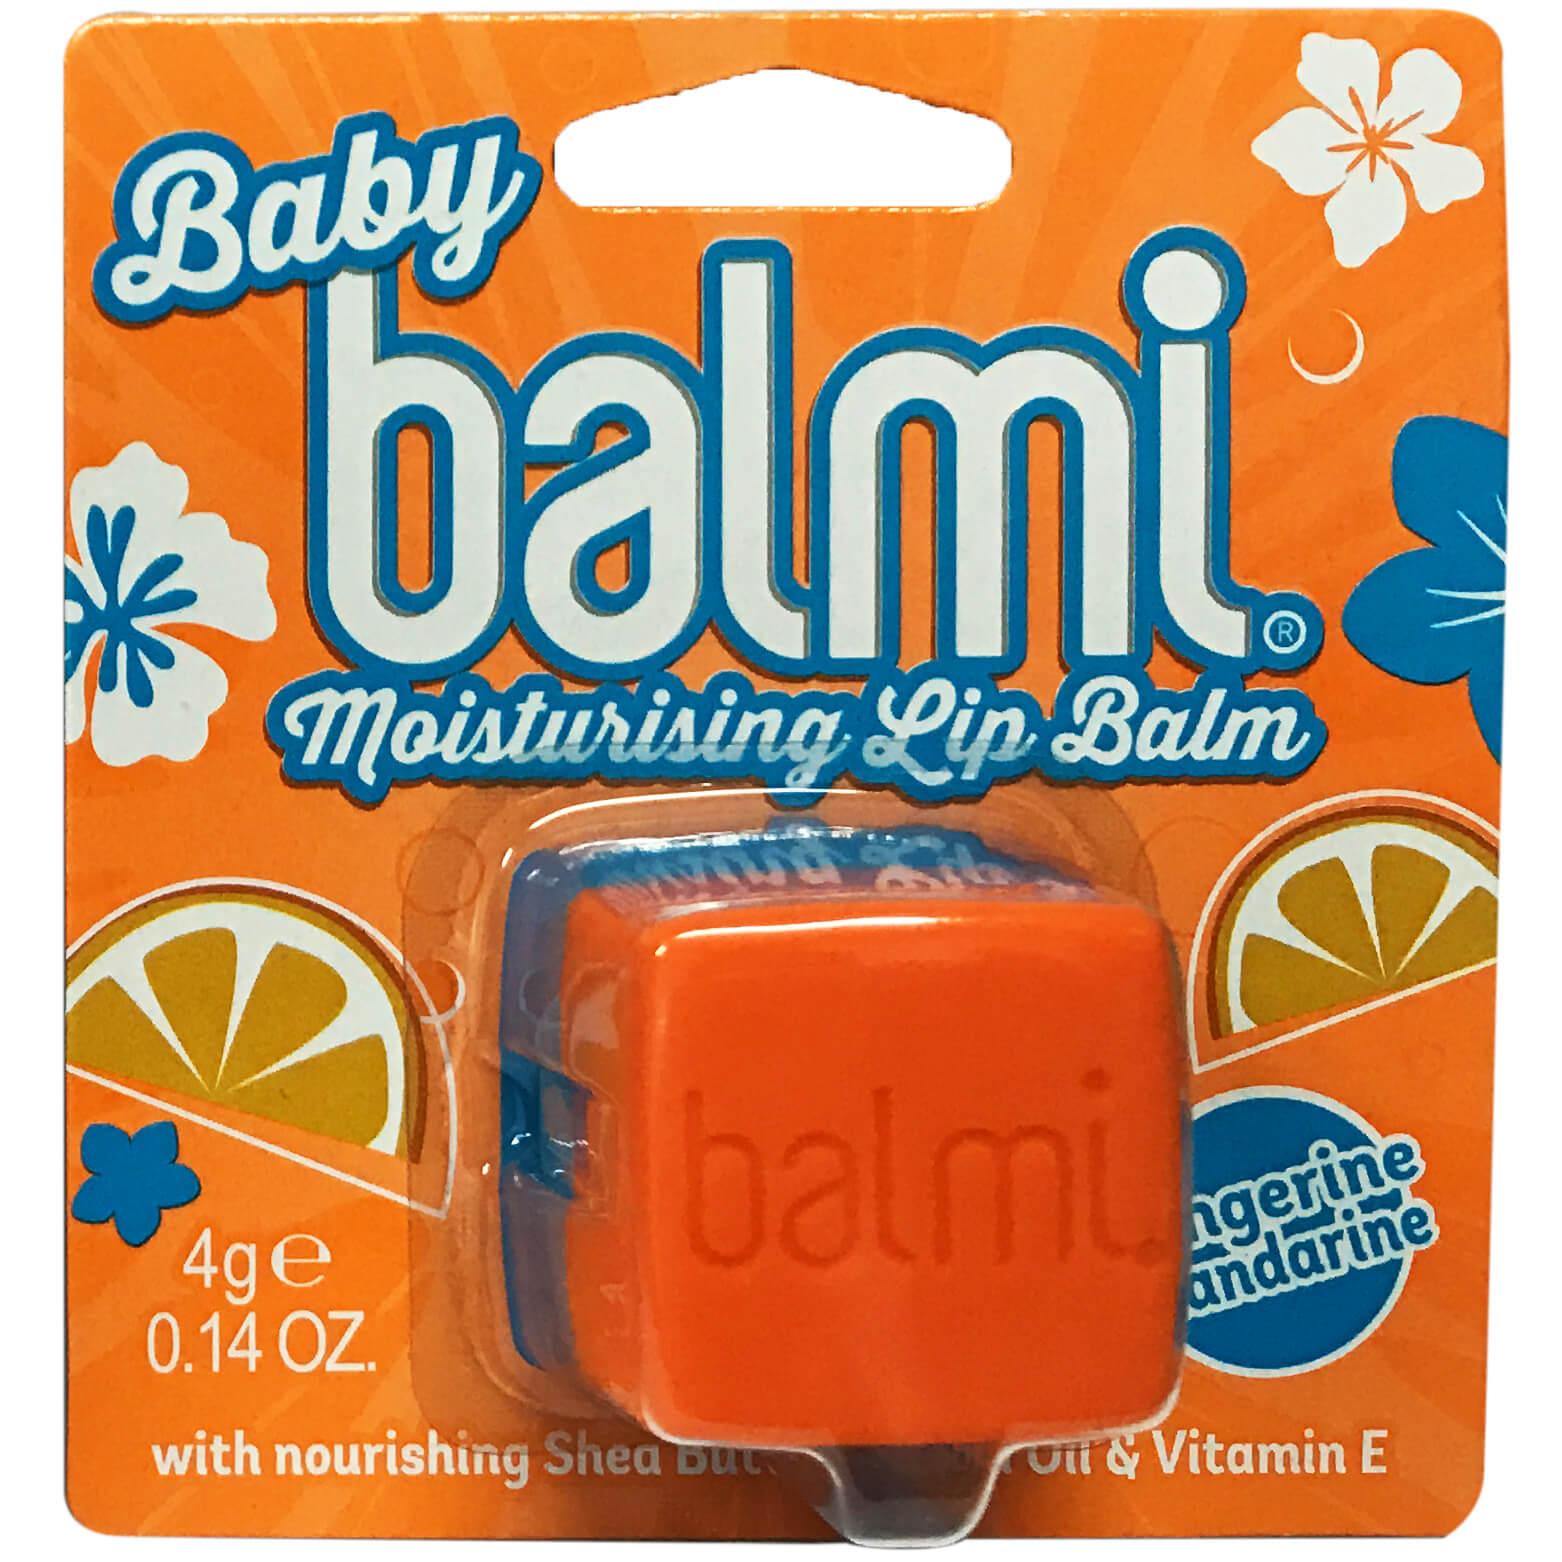 Balmi Baby Balmi Moisturising Lip Balm Ενυδατικό Balm Χειλιών 4g – Tangerine